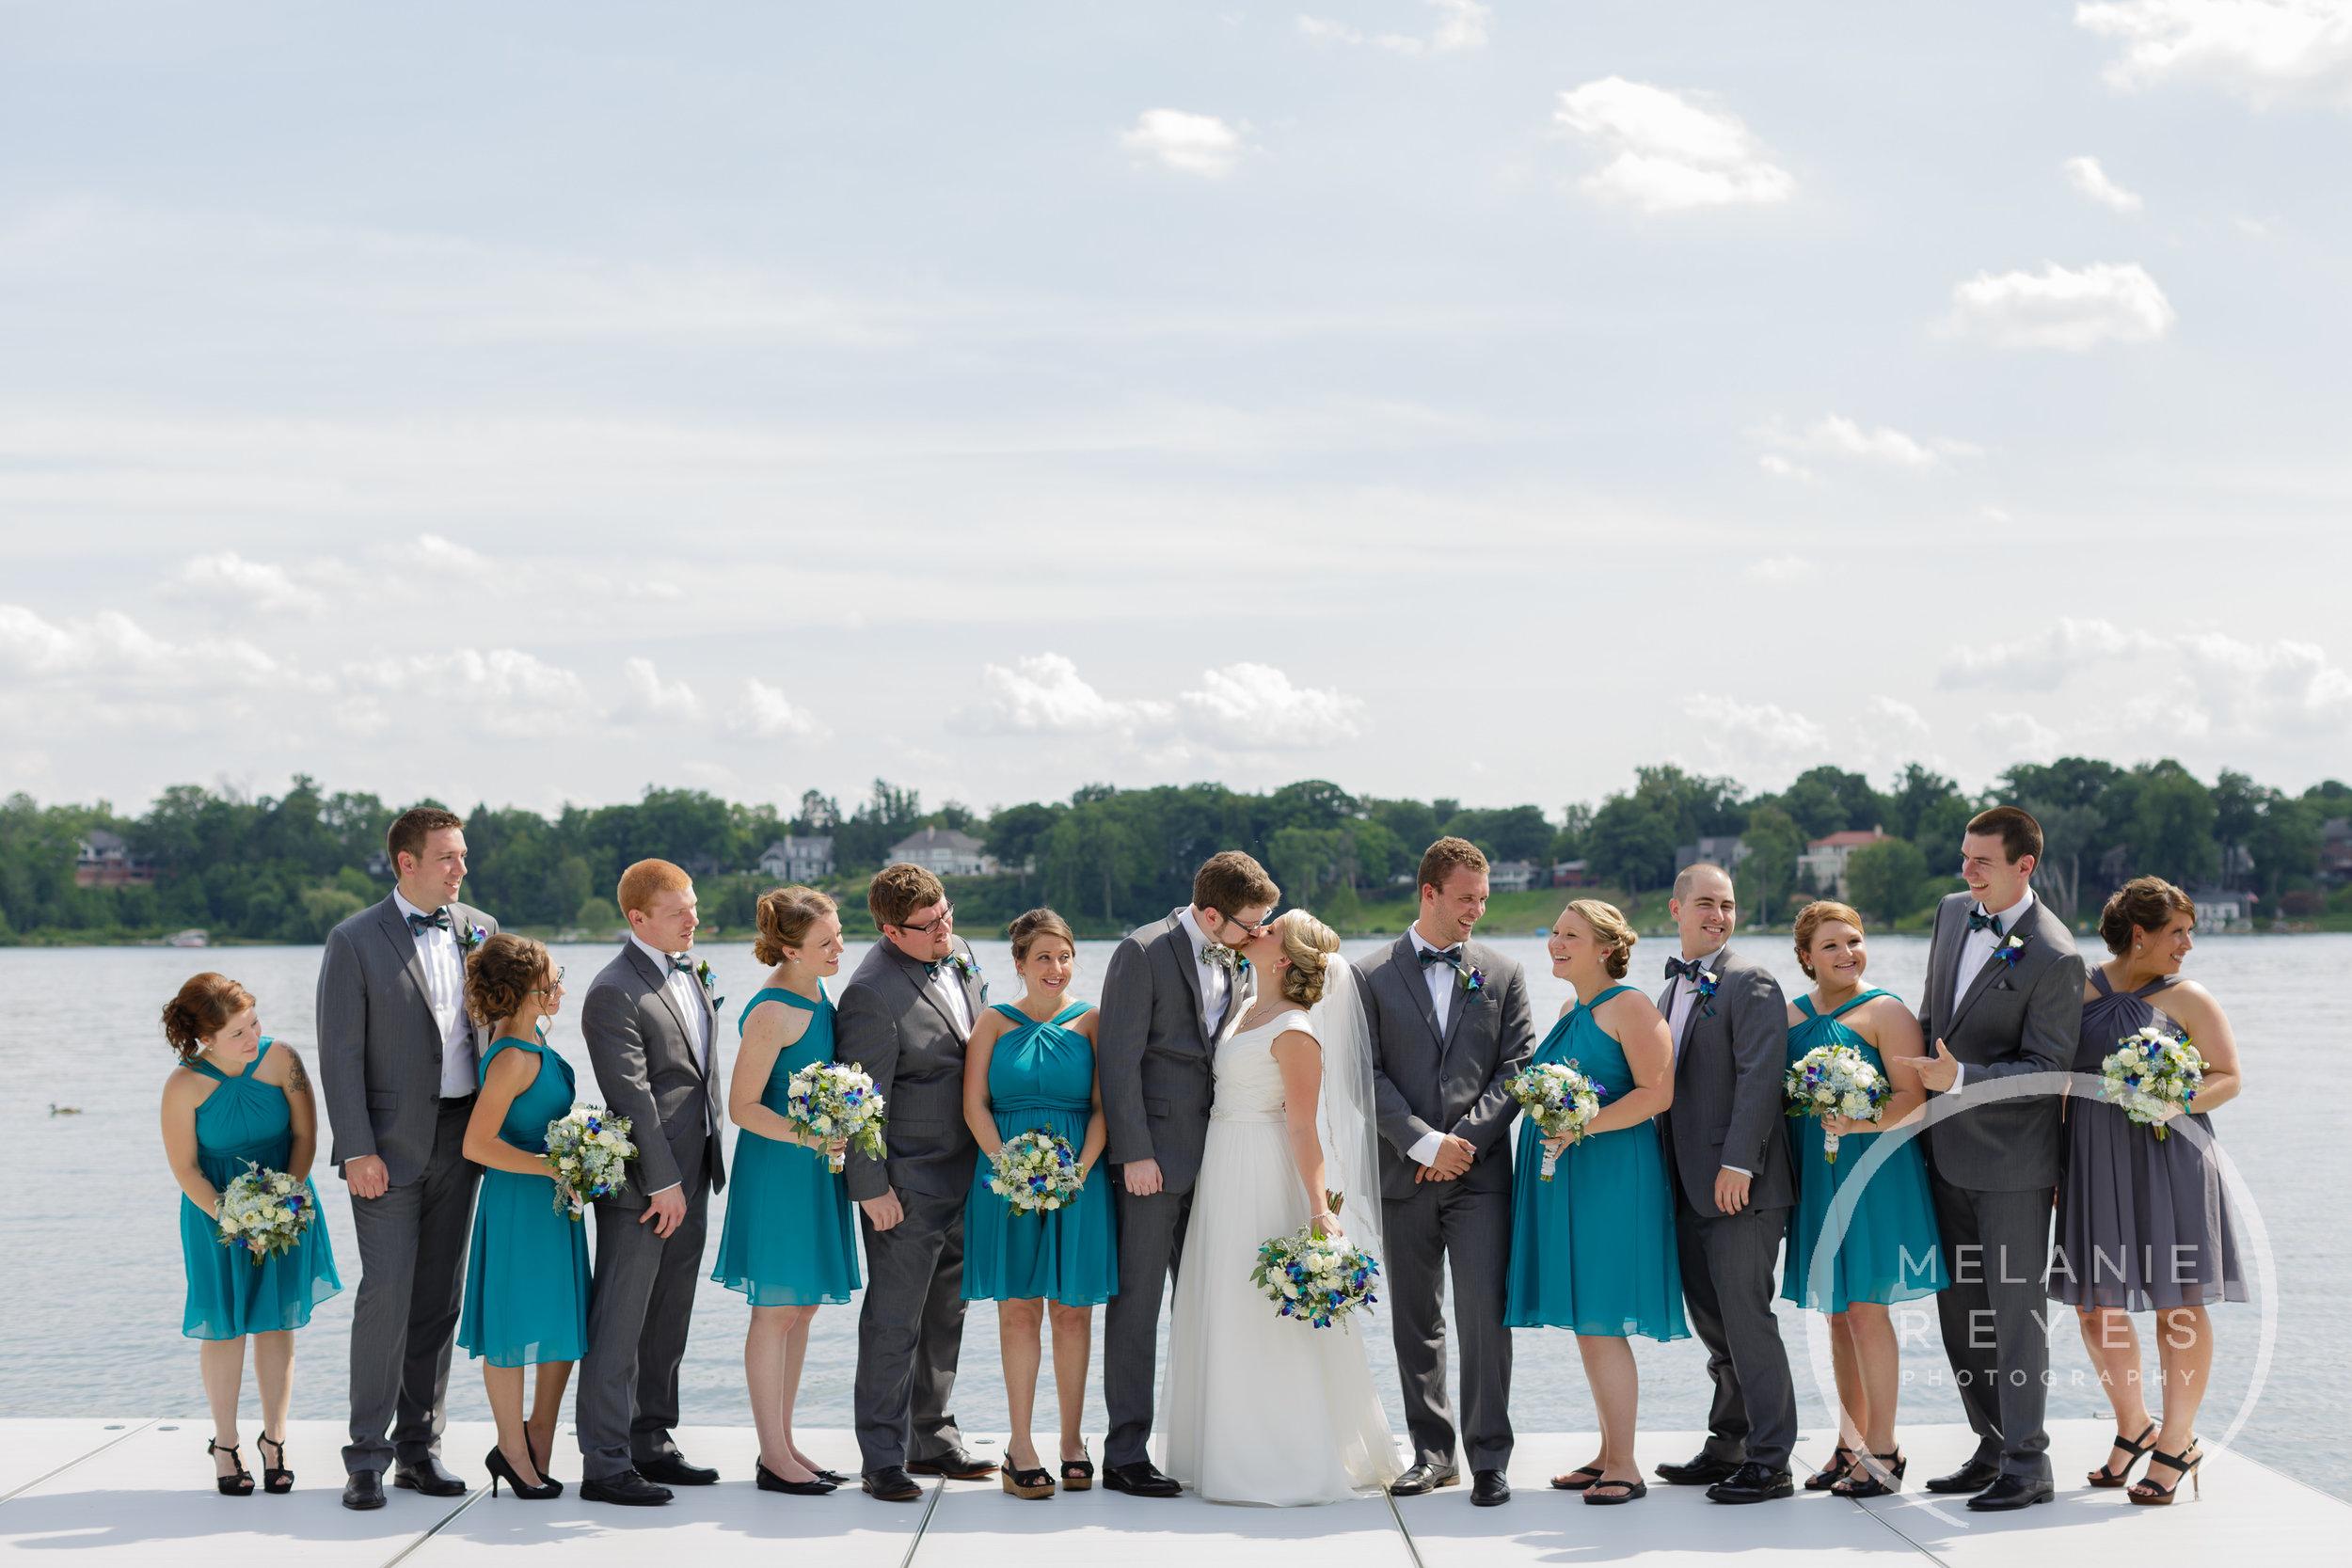 047_grandrapids_wedding_photographer_melaniereyes.JPG